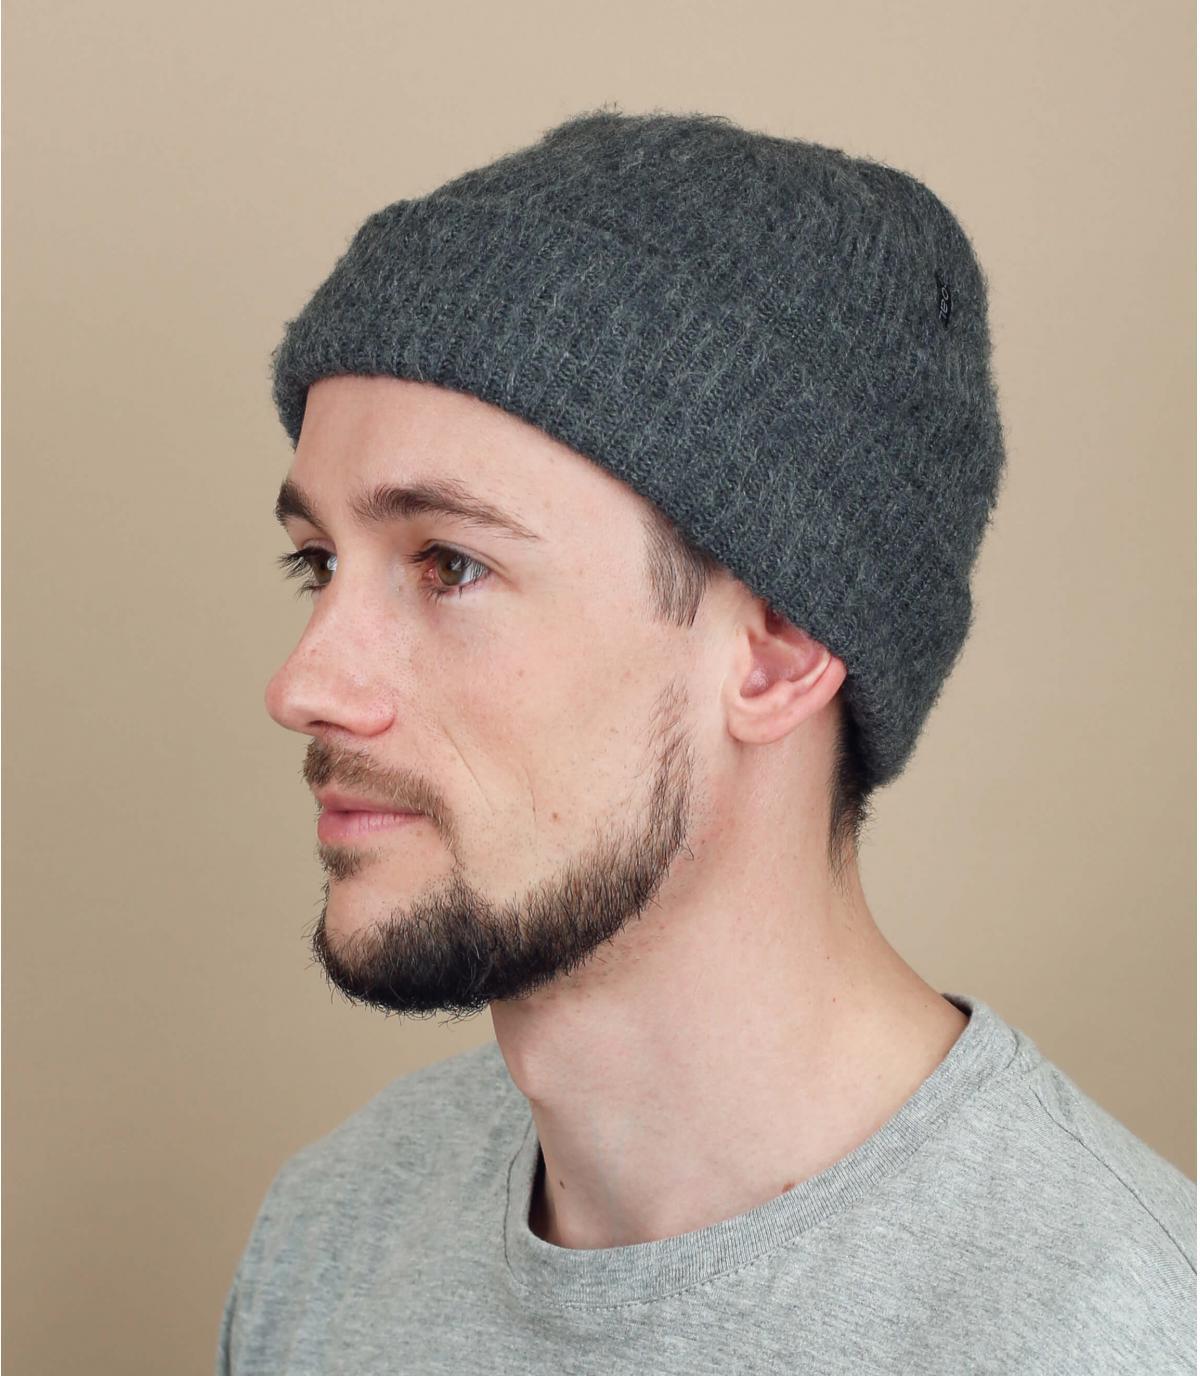 cappello grigio lungo del carbone